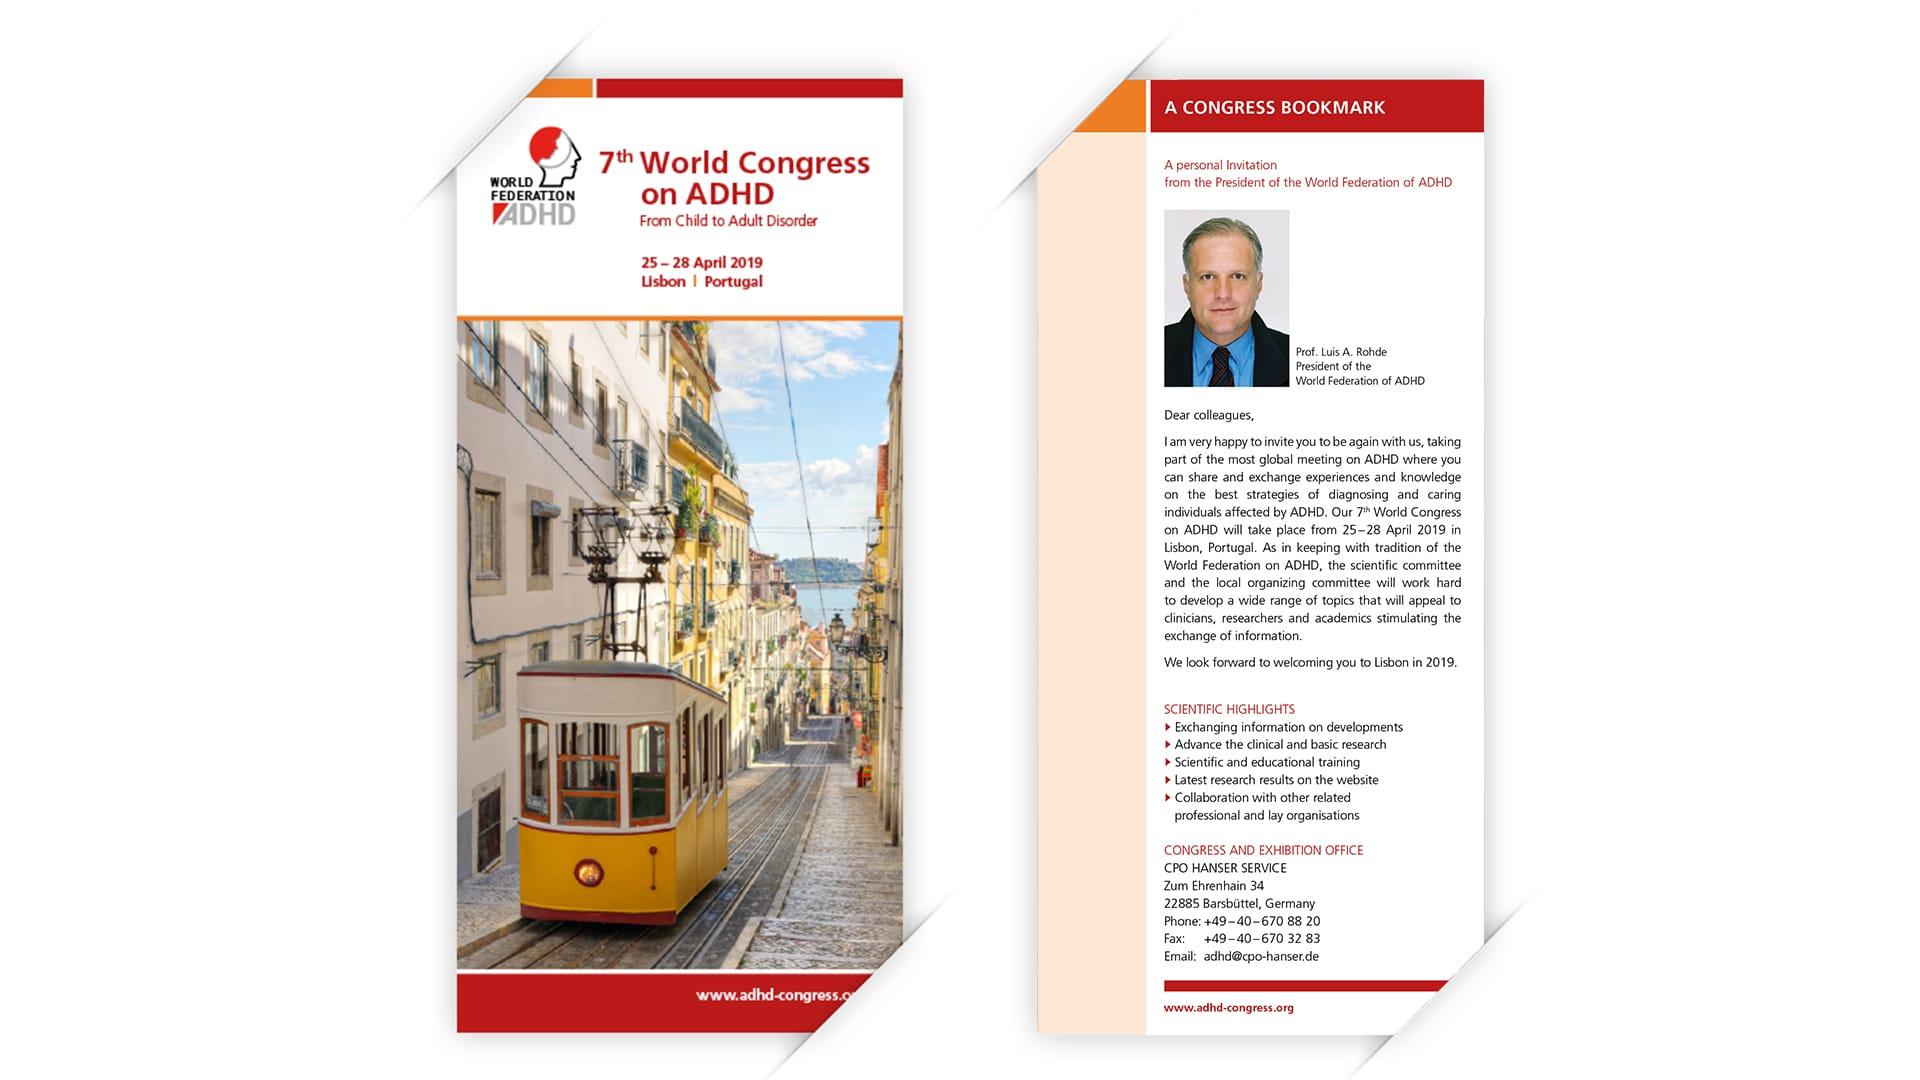 Bookmark 7th World Congress on ADHD Lisbon 2019